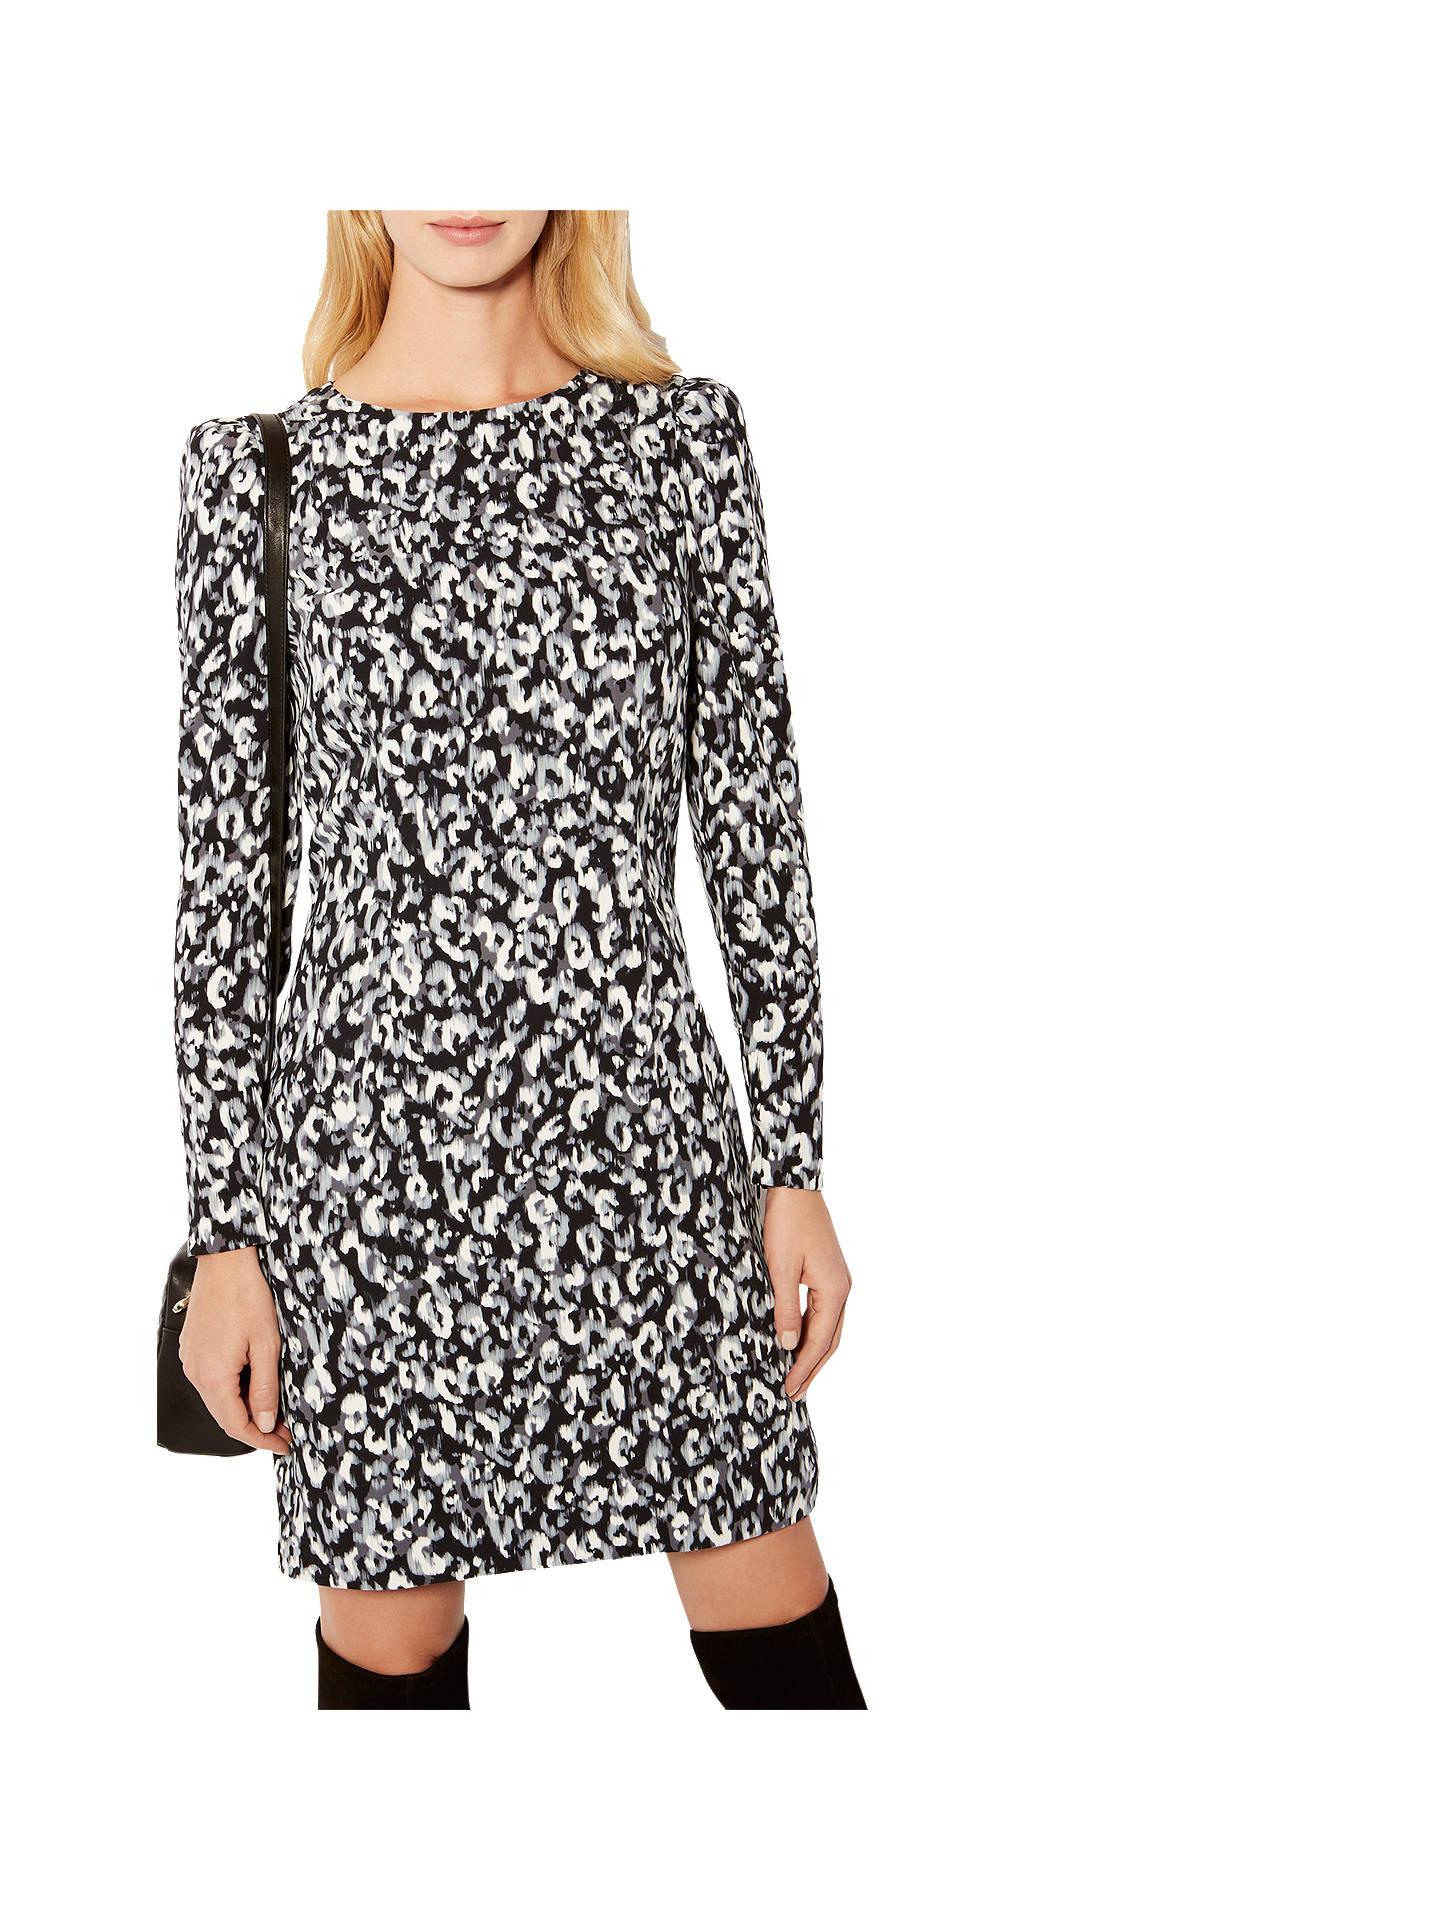 5950fc806119 Buy Karen Millen Leopard Print Pencil Dress, Grey/Multi, 6 Online at  johnlewis ...